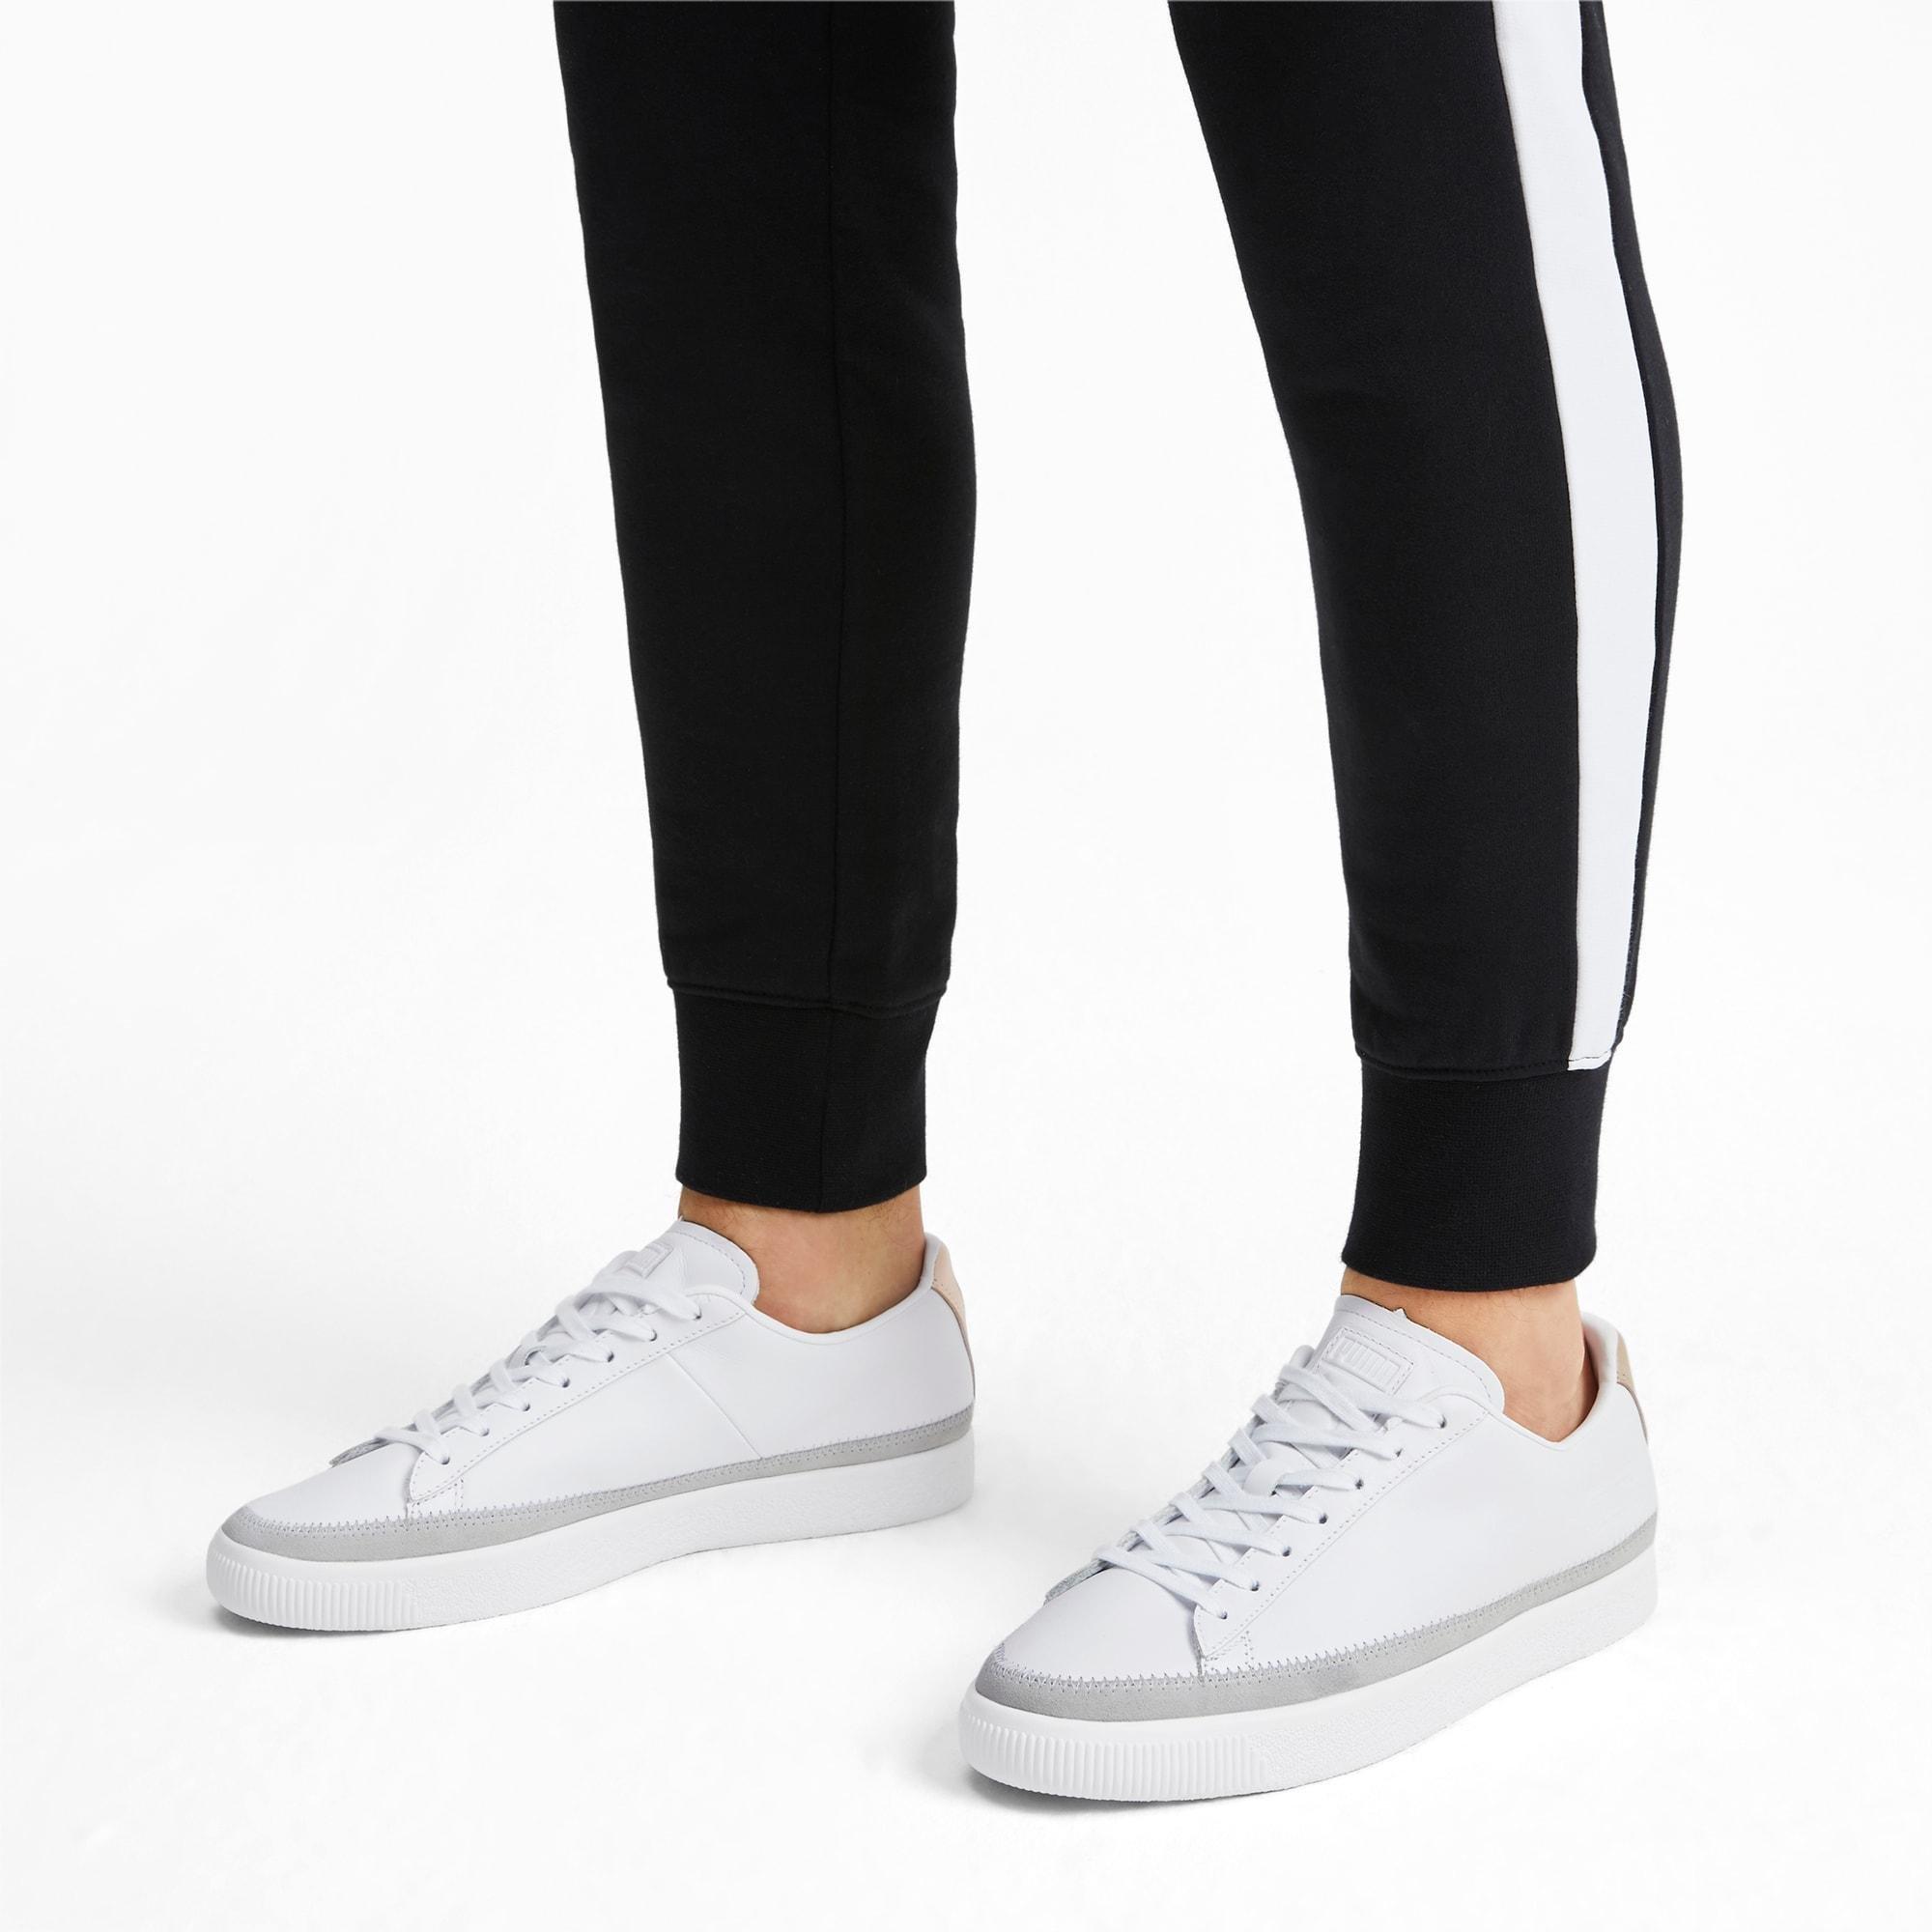 PUMA Suede Basket Trim Block Sneakers